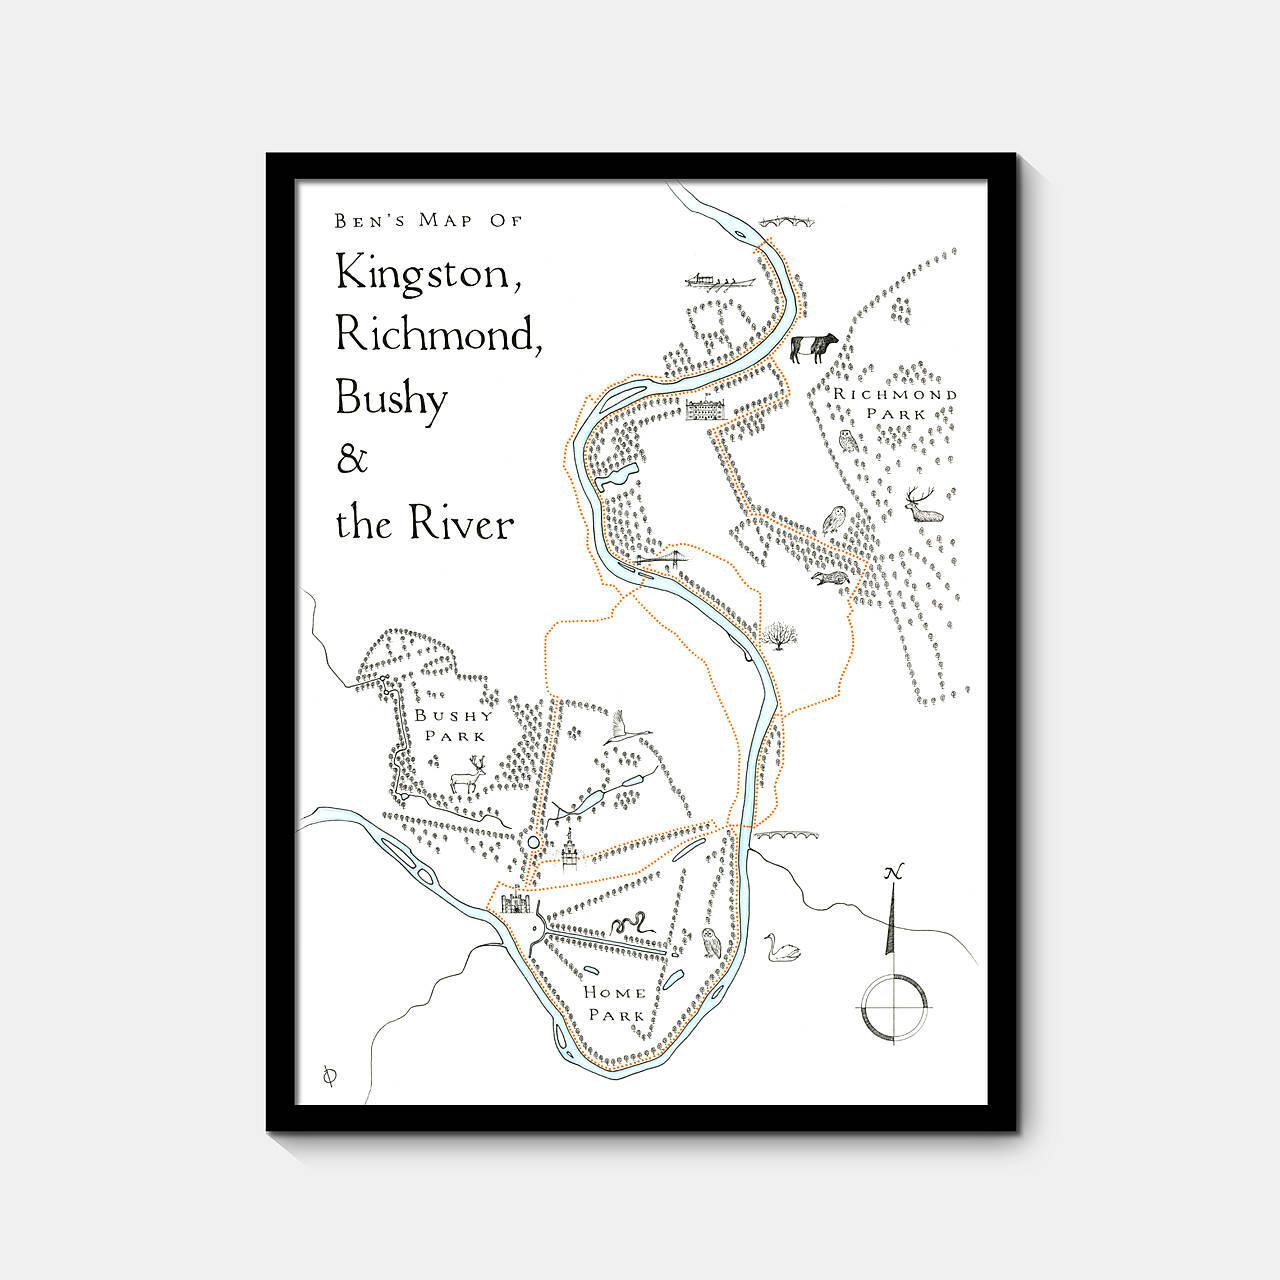 commission -Kingston, Richmond, Bushy and the River -Ben -framed.jpg